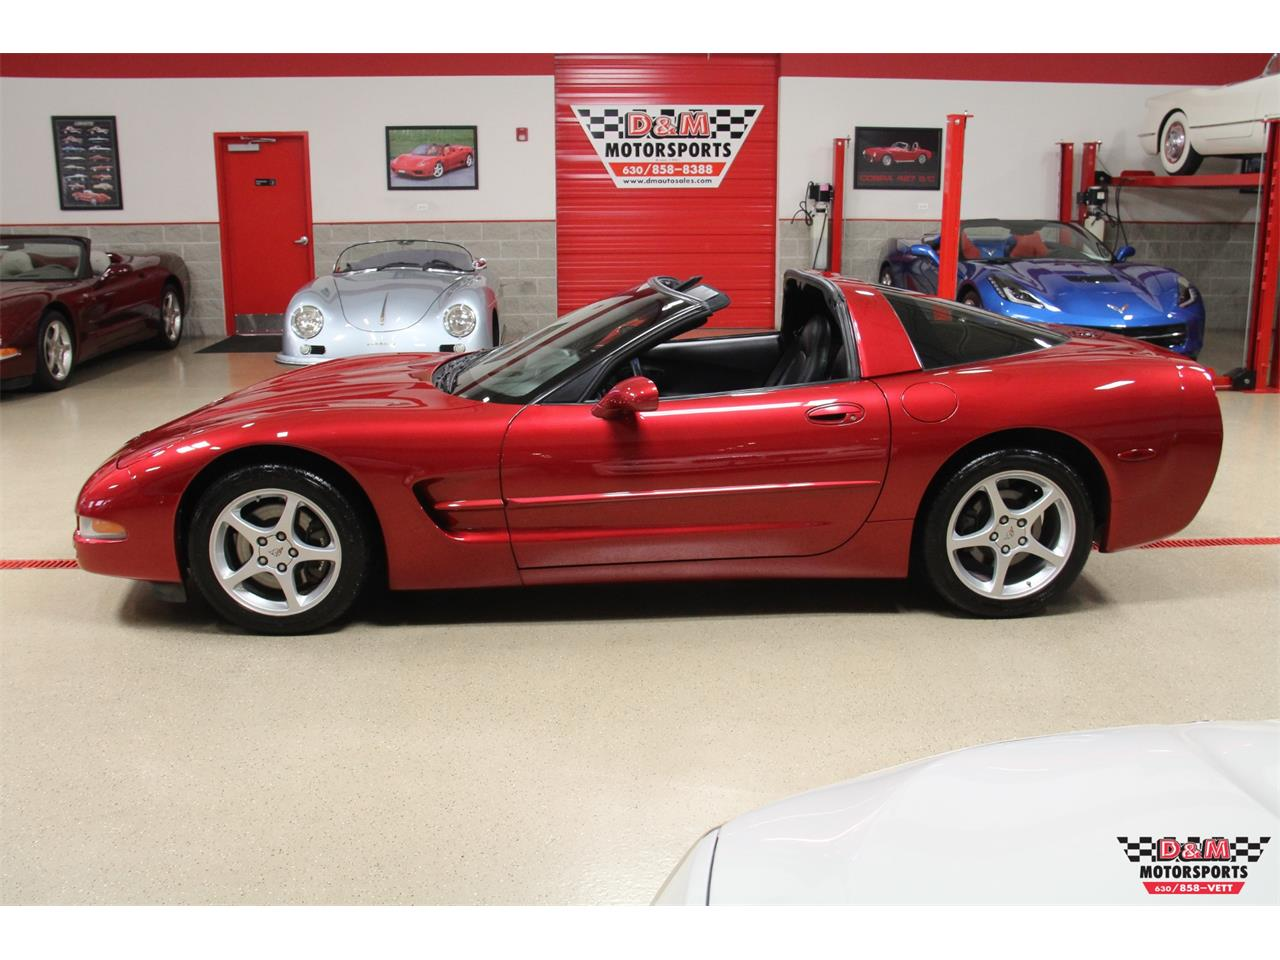 Large Picture of 2000 Corvette located in Glen Ellyn Illinois - $15,995.00 - LVA3